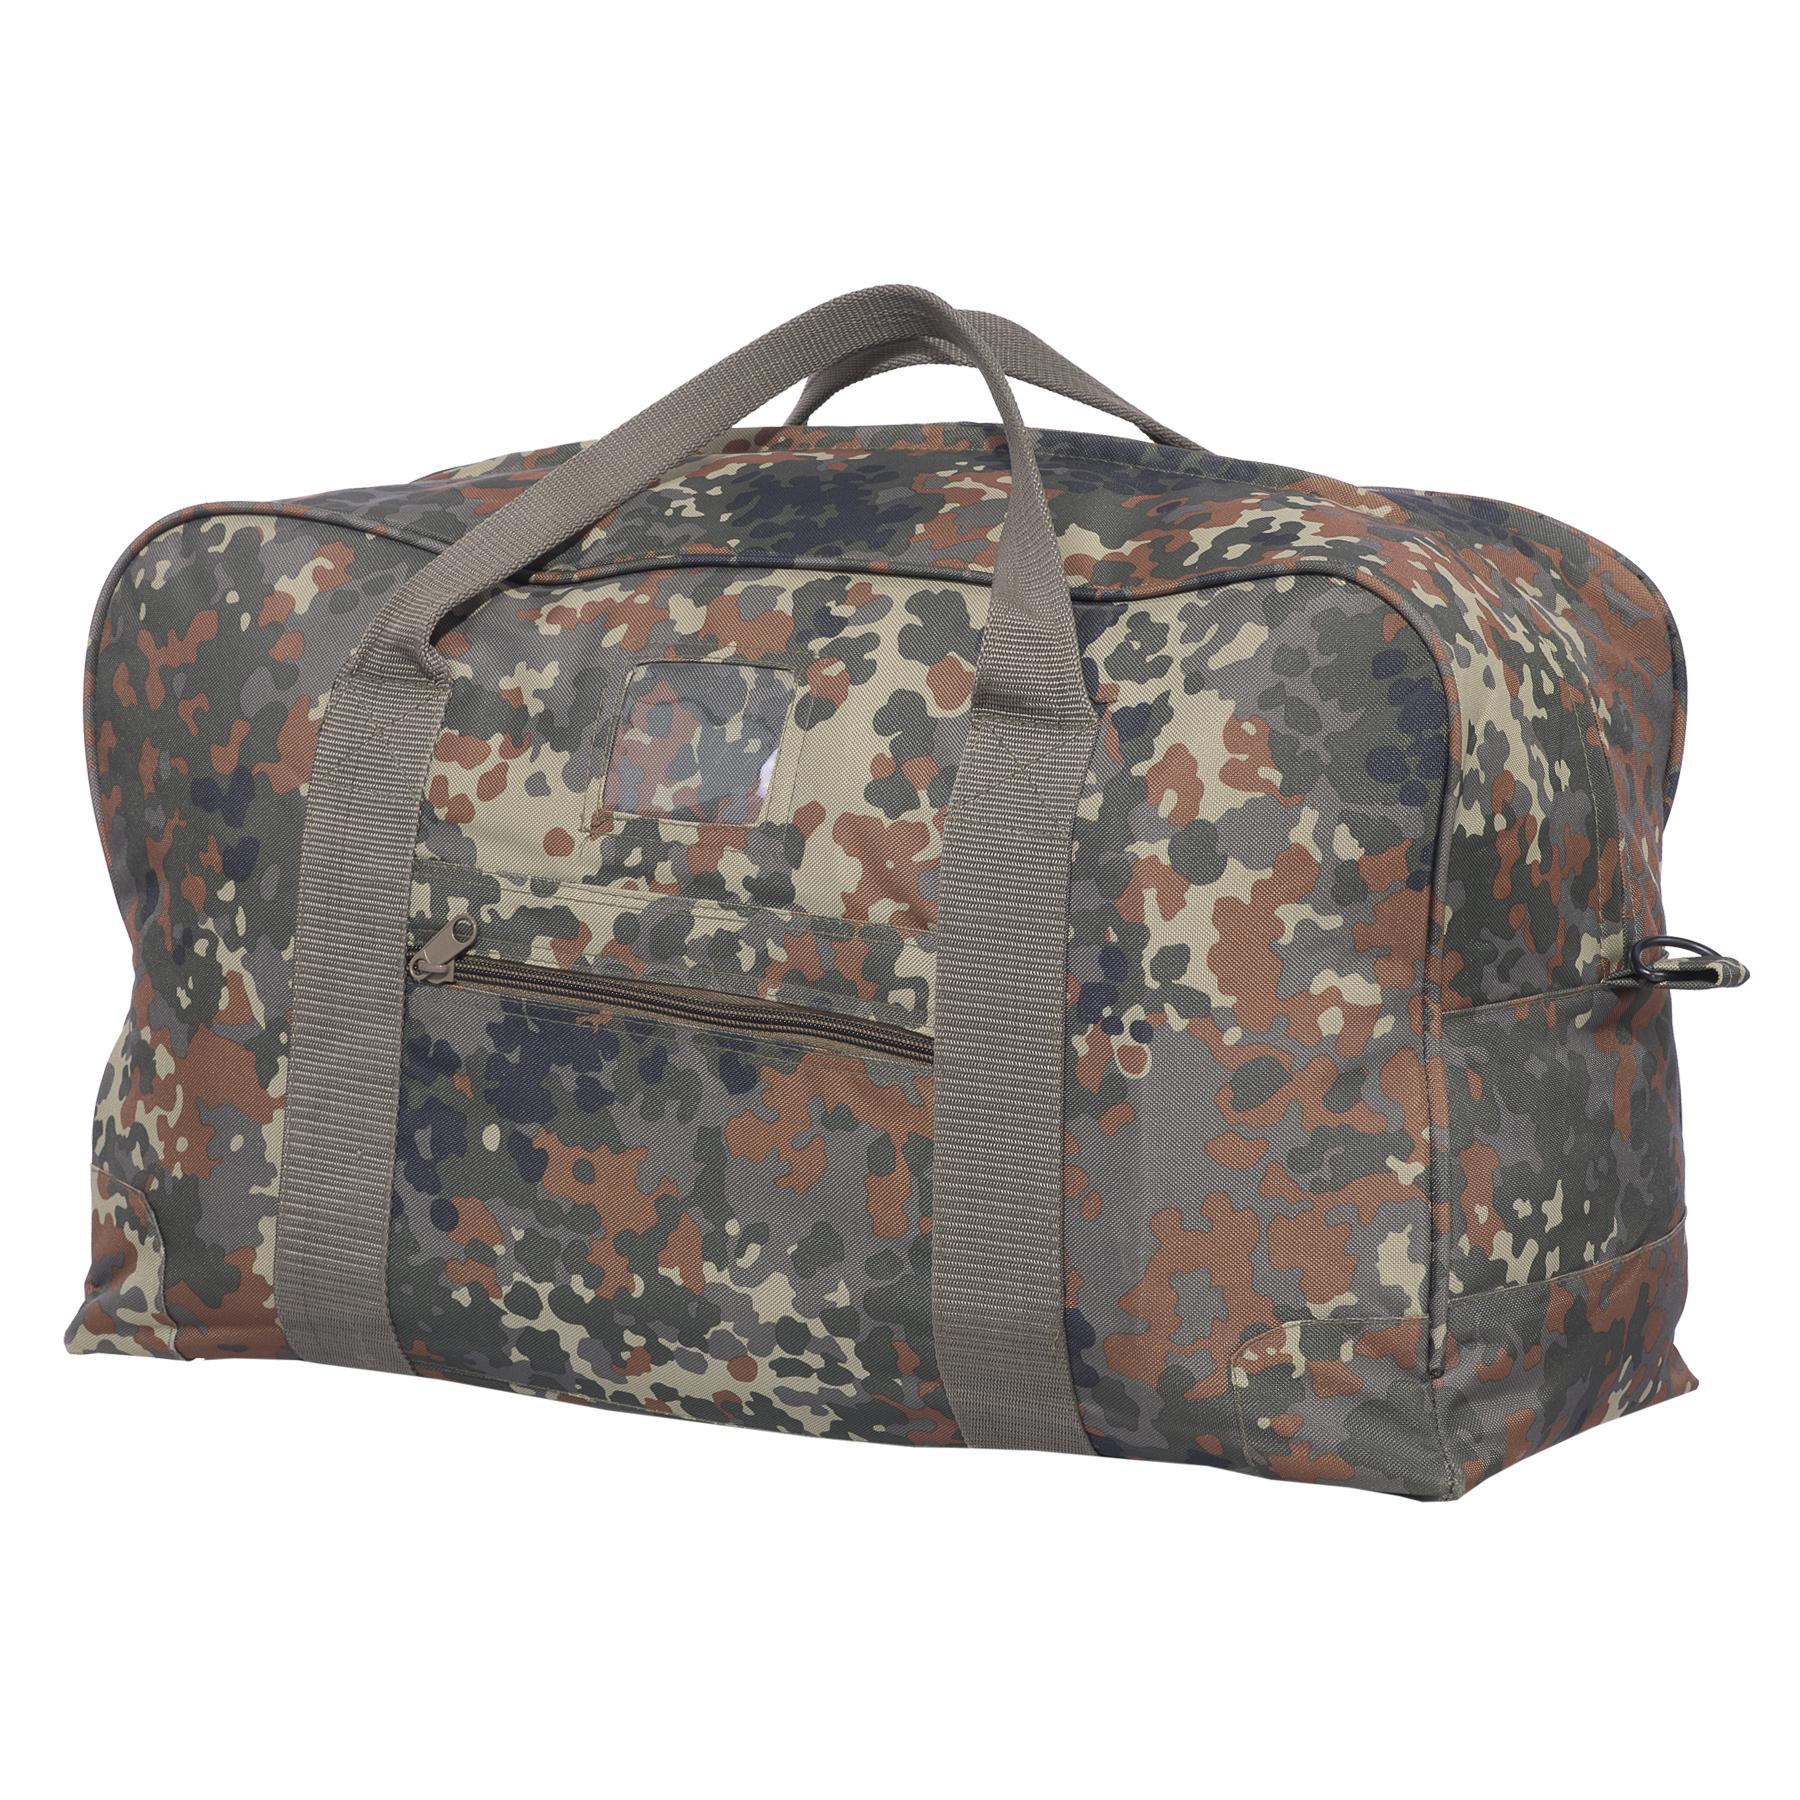 ea8b8330f Pentagon - cestovná taška BW flecktarn - nová